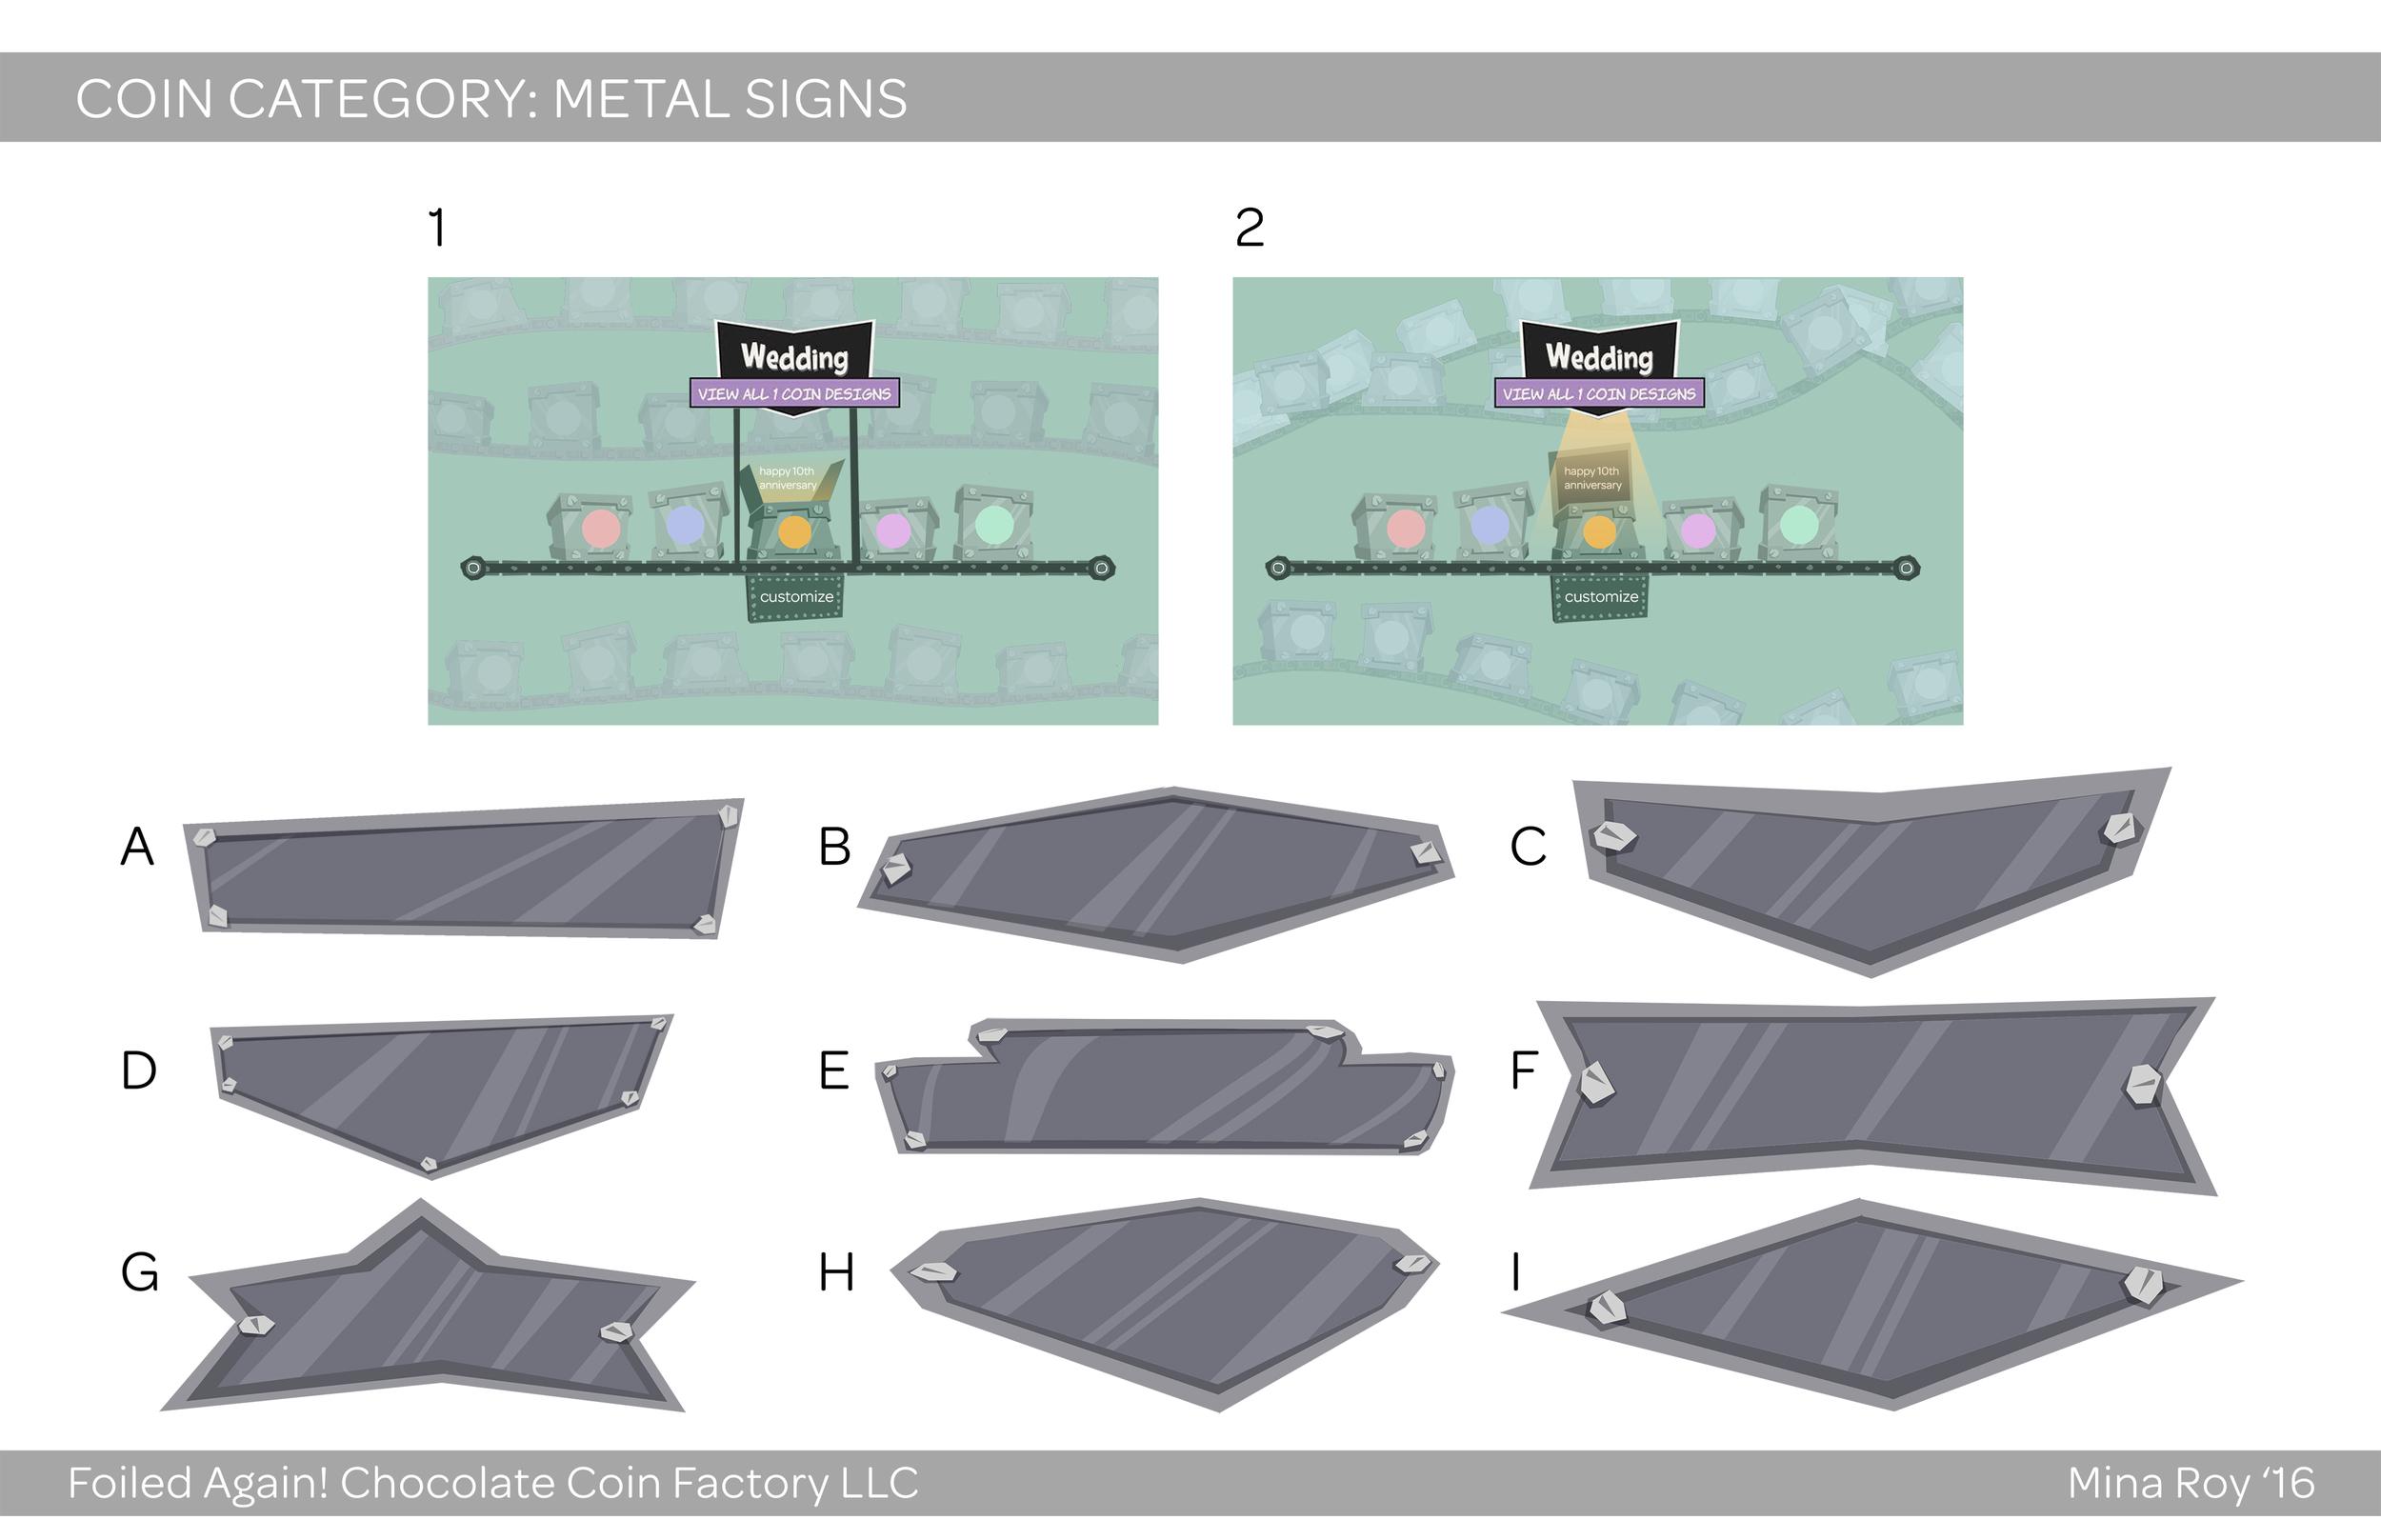 MinaRoy_FA_website-coincategory-metalsigns-8x12.jpg